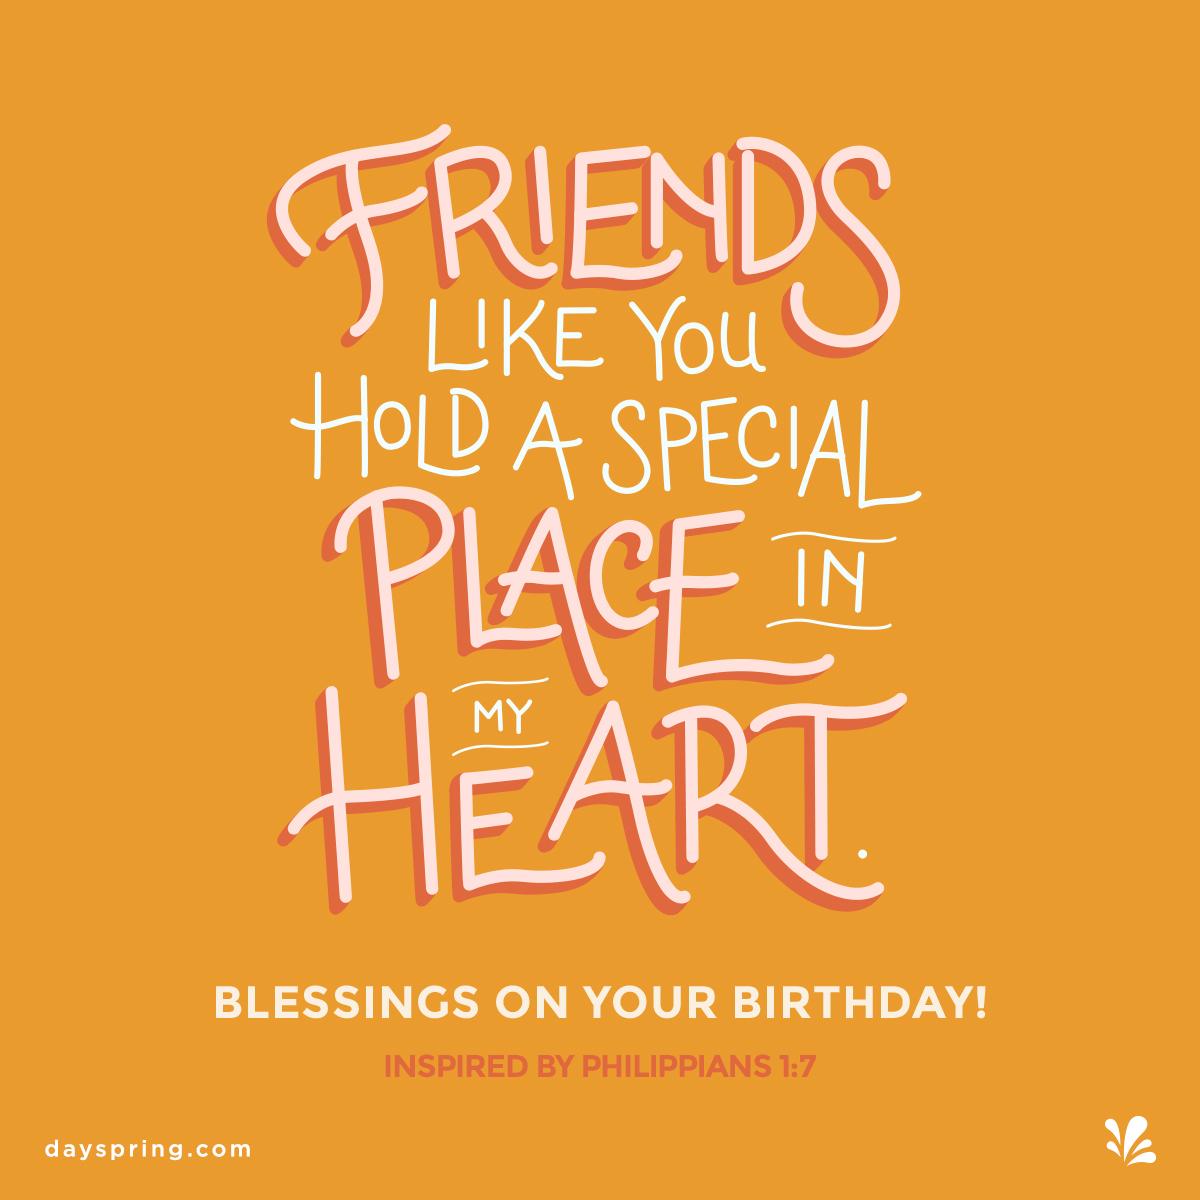 Birthday Ecards | Dayspring - Free Printable Christian Cards Online